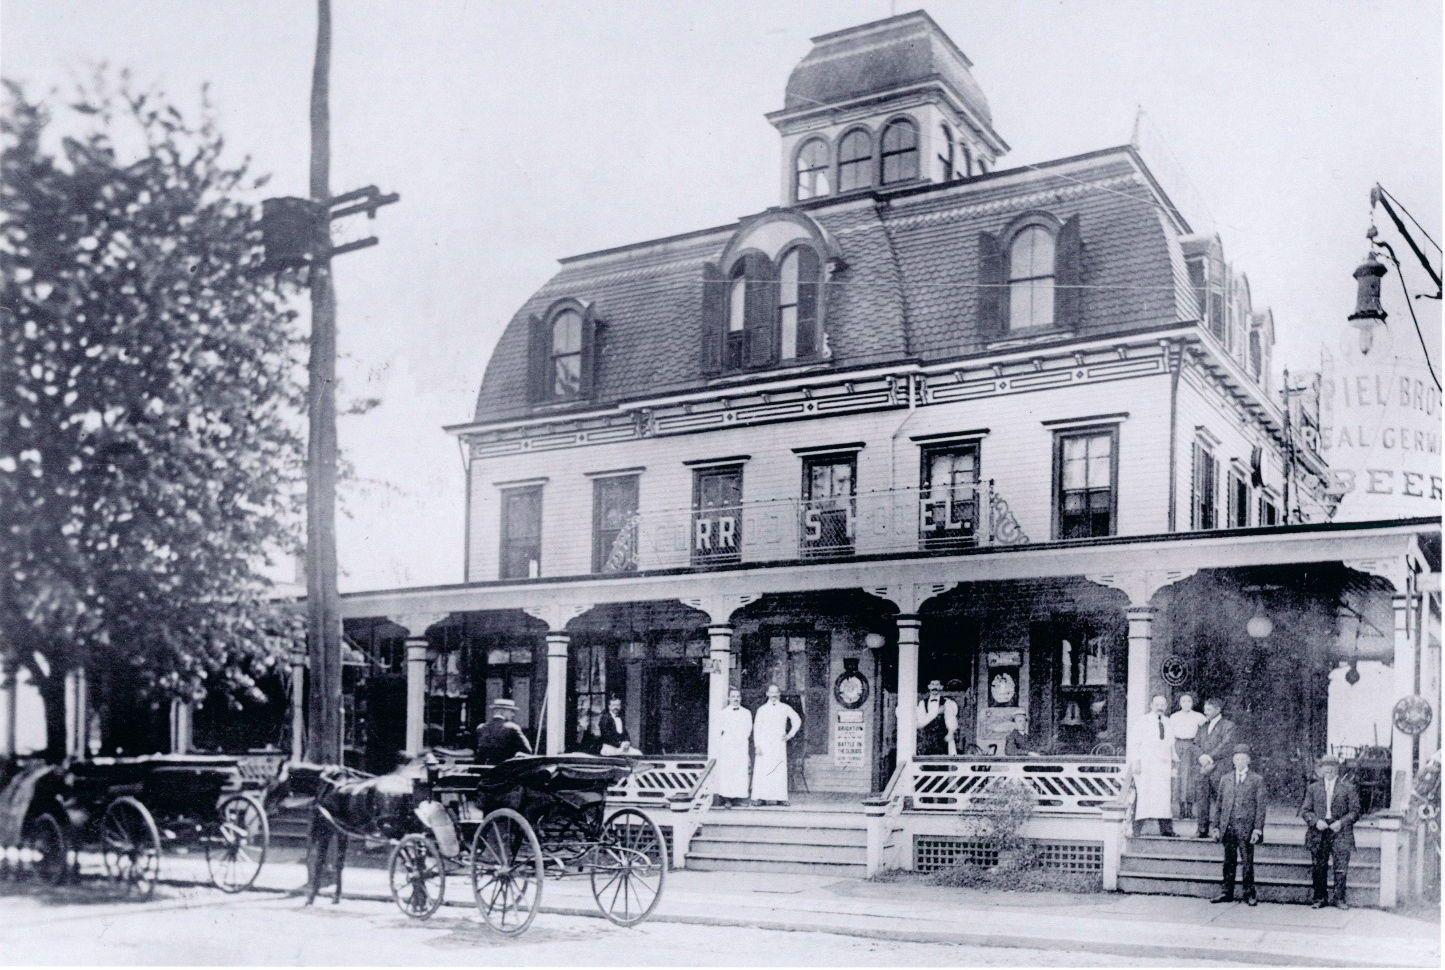 1908 Corrodi S Hotel E 16 St Lirr Gravesend Sheepshead Bay Brooklyn Photo Nyc Ebay